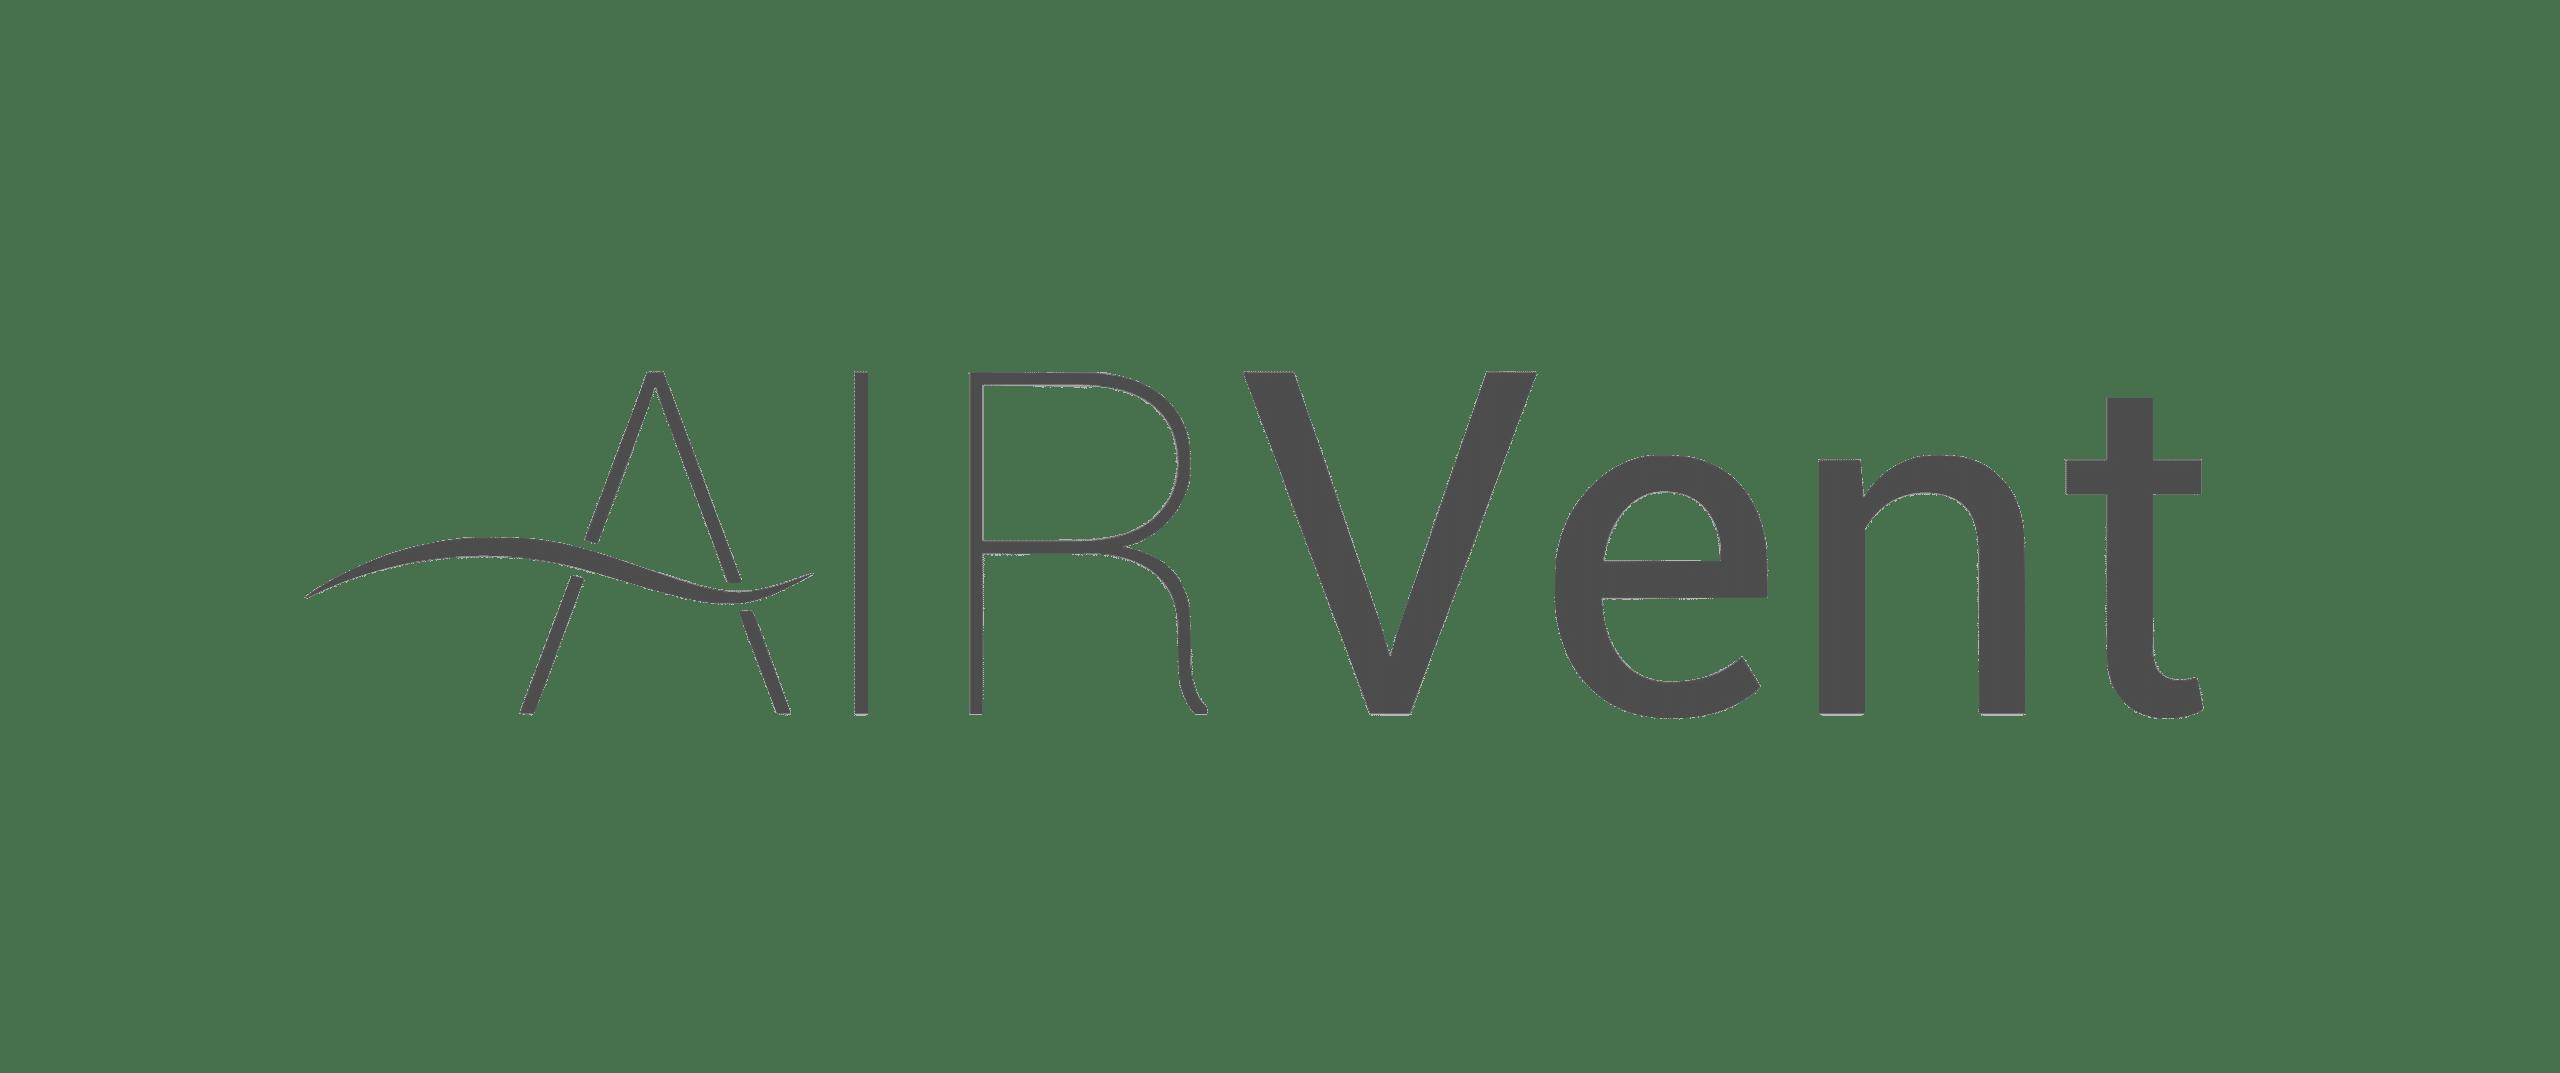 revor-airvent-logo